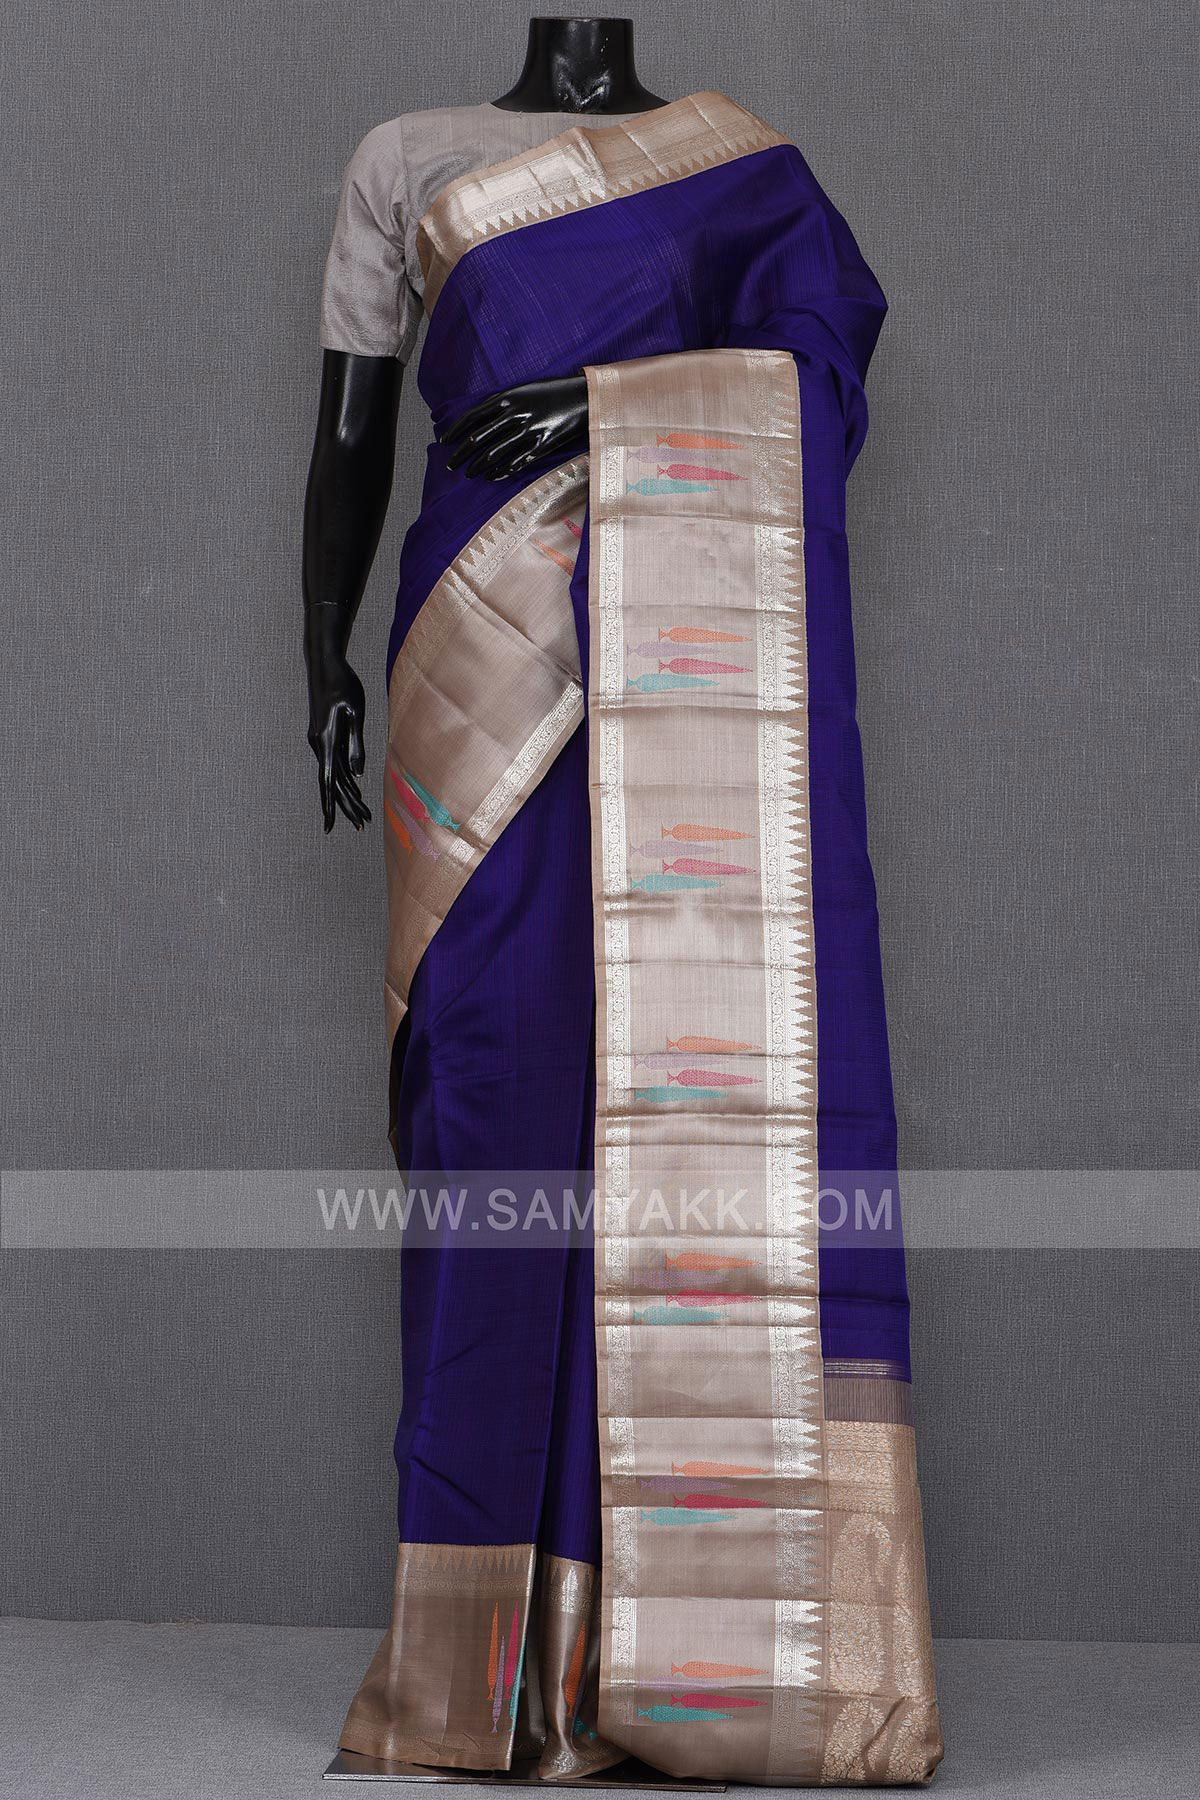 884120677069d7 ... Saree by Samyakk. Chic and fabulous, this indigo blue color six yard  kanchipuram or kanjeevaram silk is a